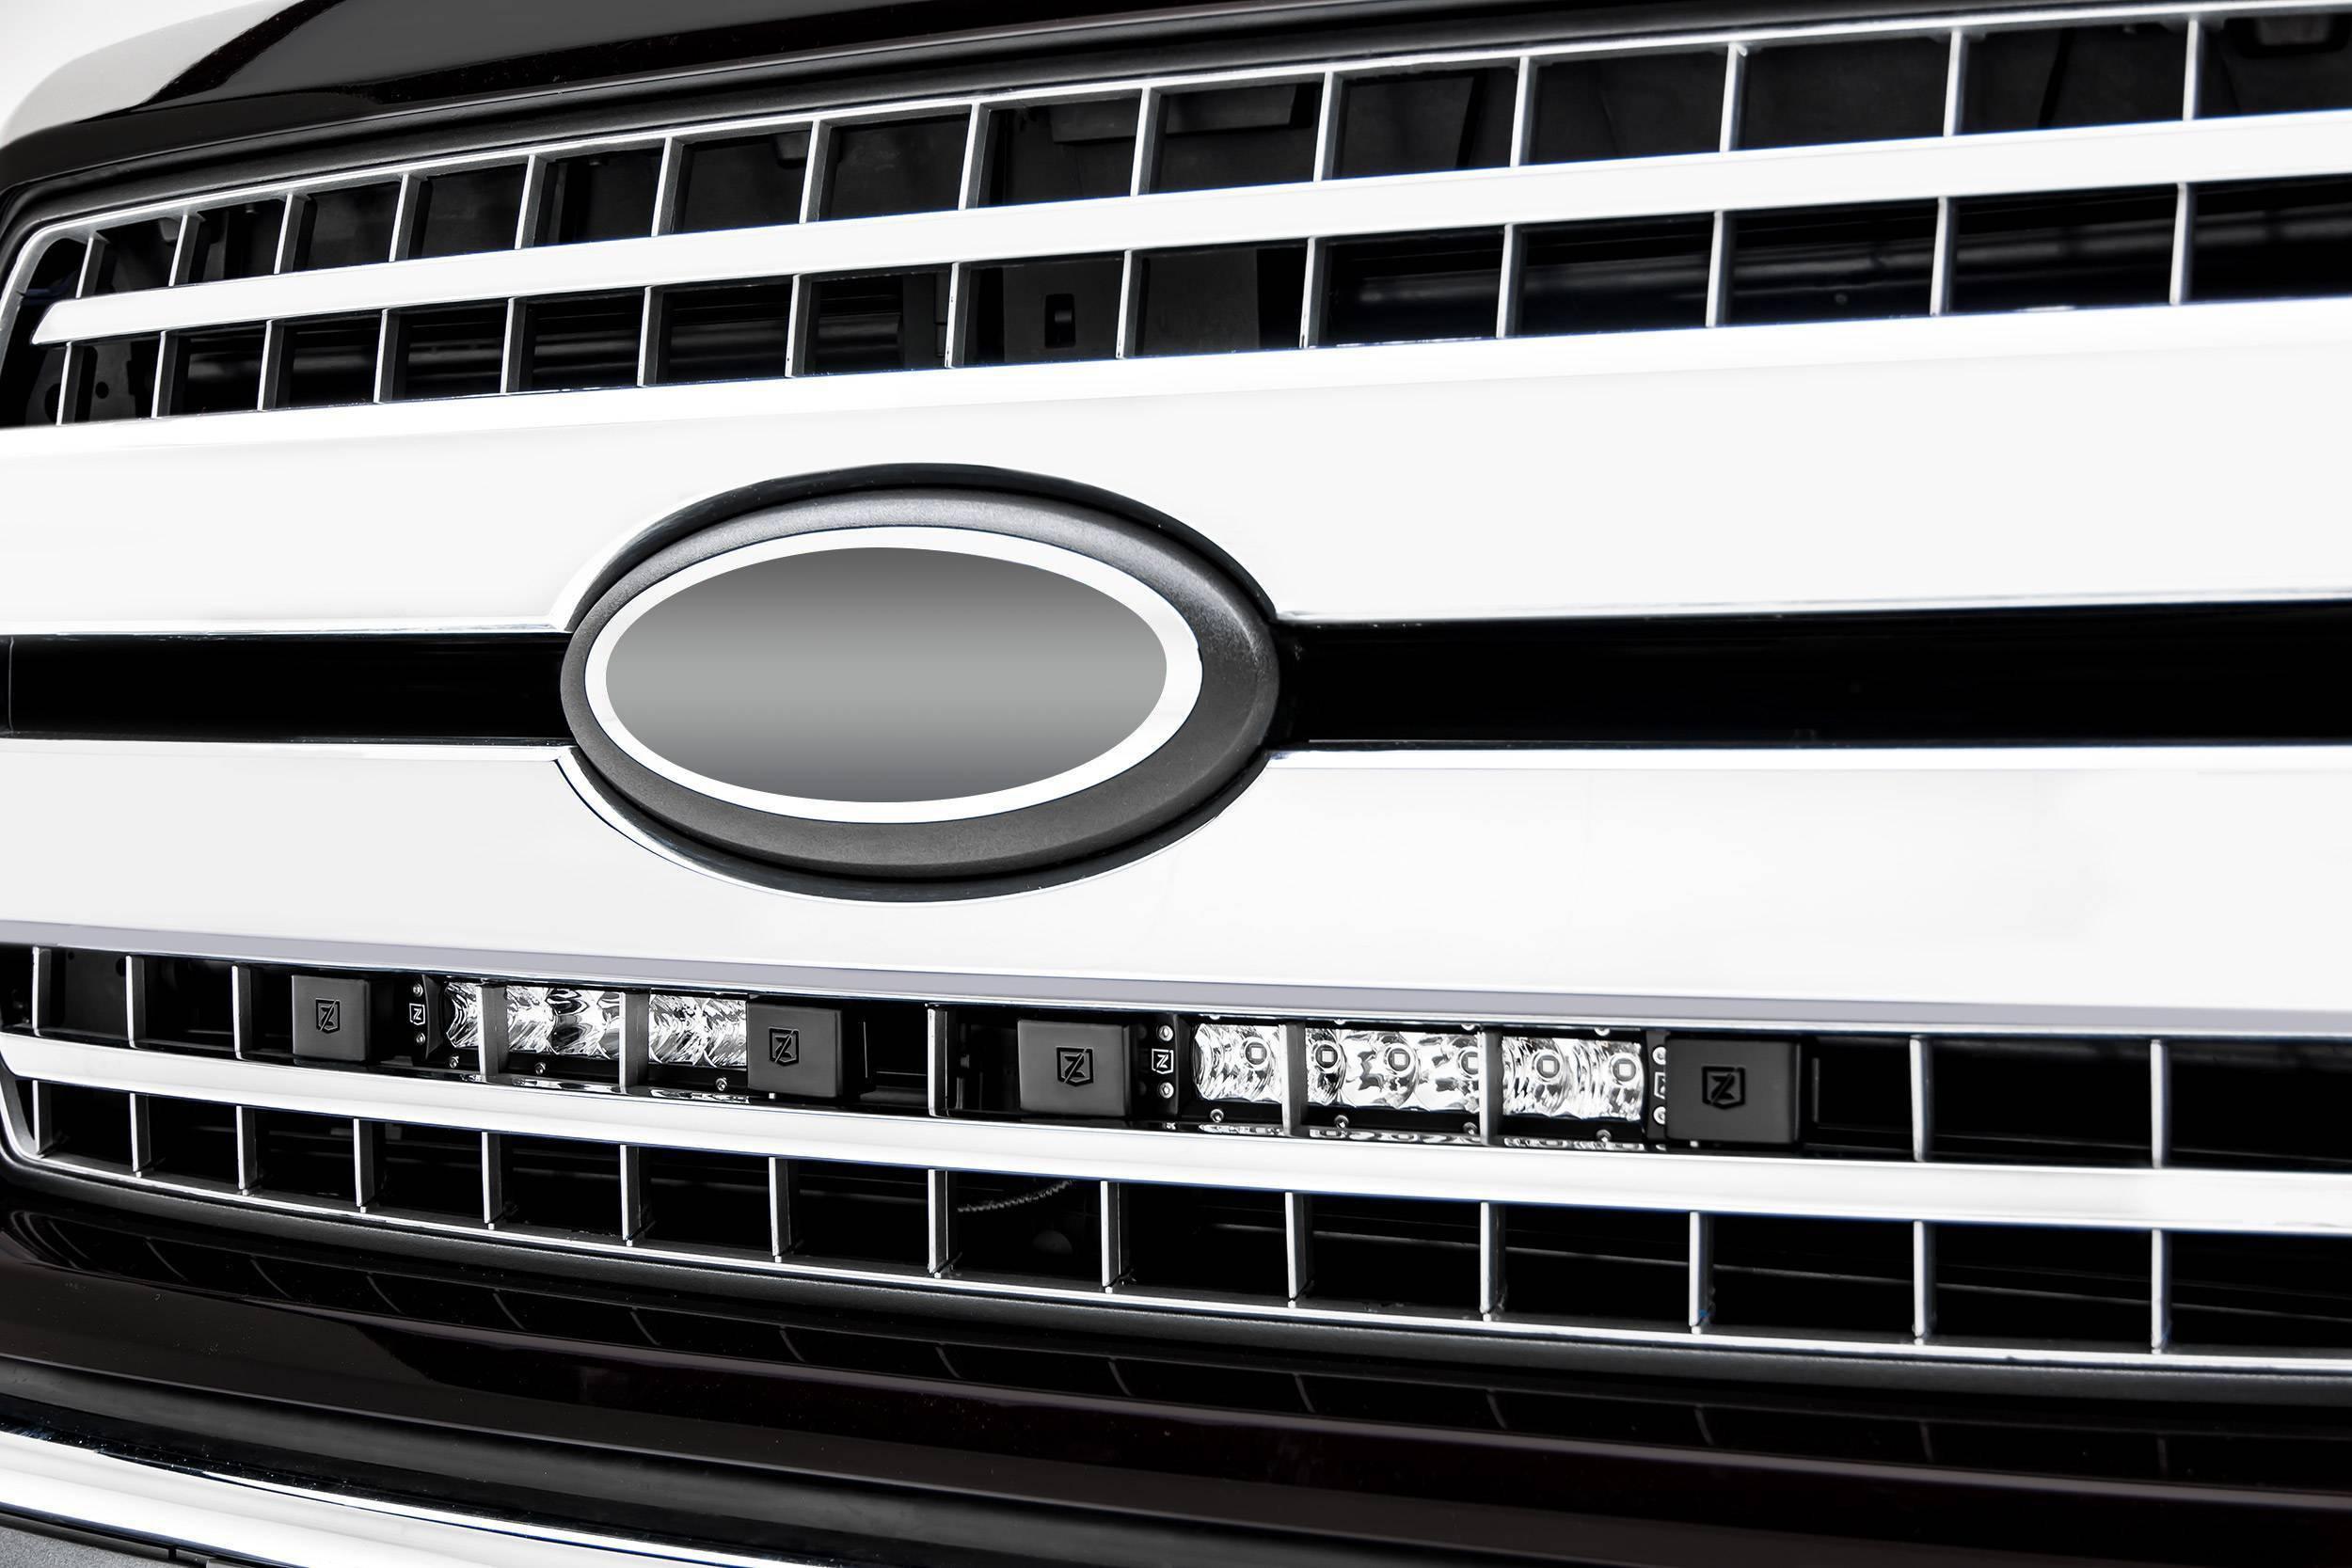 ZROADZ                                             - 2018-2020 Ford F-150 XLT, Lariat OEM Grille LED Kit with (2) 6 Inch LED Straight Single Row Slim Light Bars - PN #Z415711-KIT